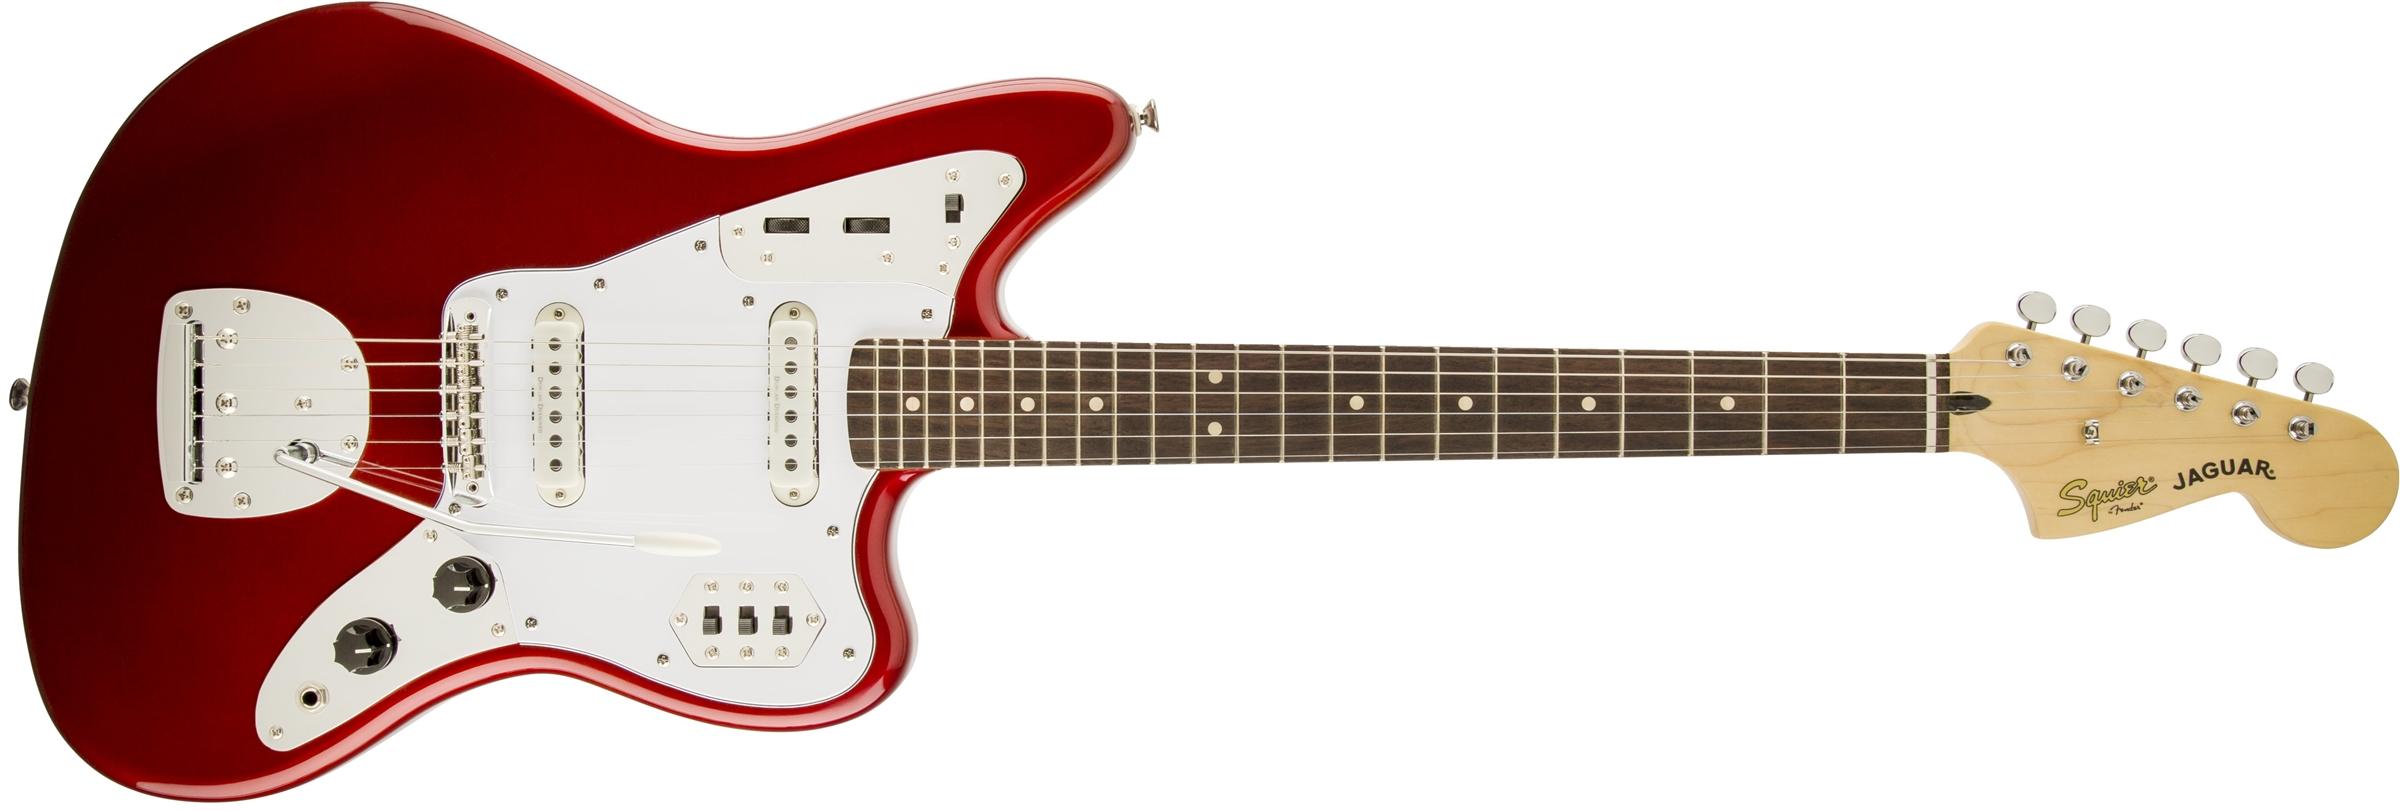 Fender Pawn Shop Mustang Special Wiring Diagram Diagrams Schema Jaguar Hh Vintage Modified Squier Electric Guitars Series Japan